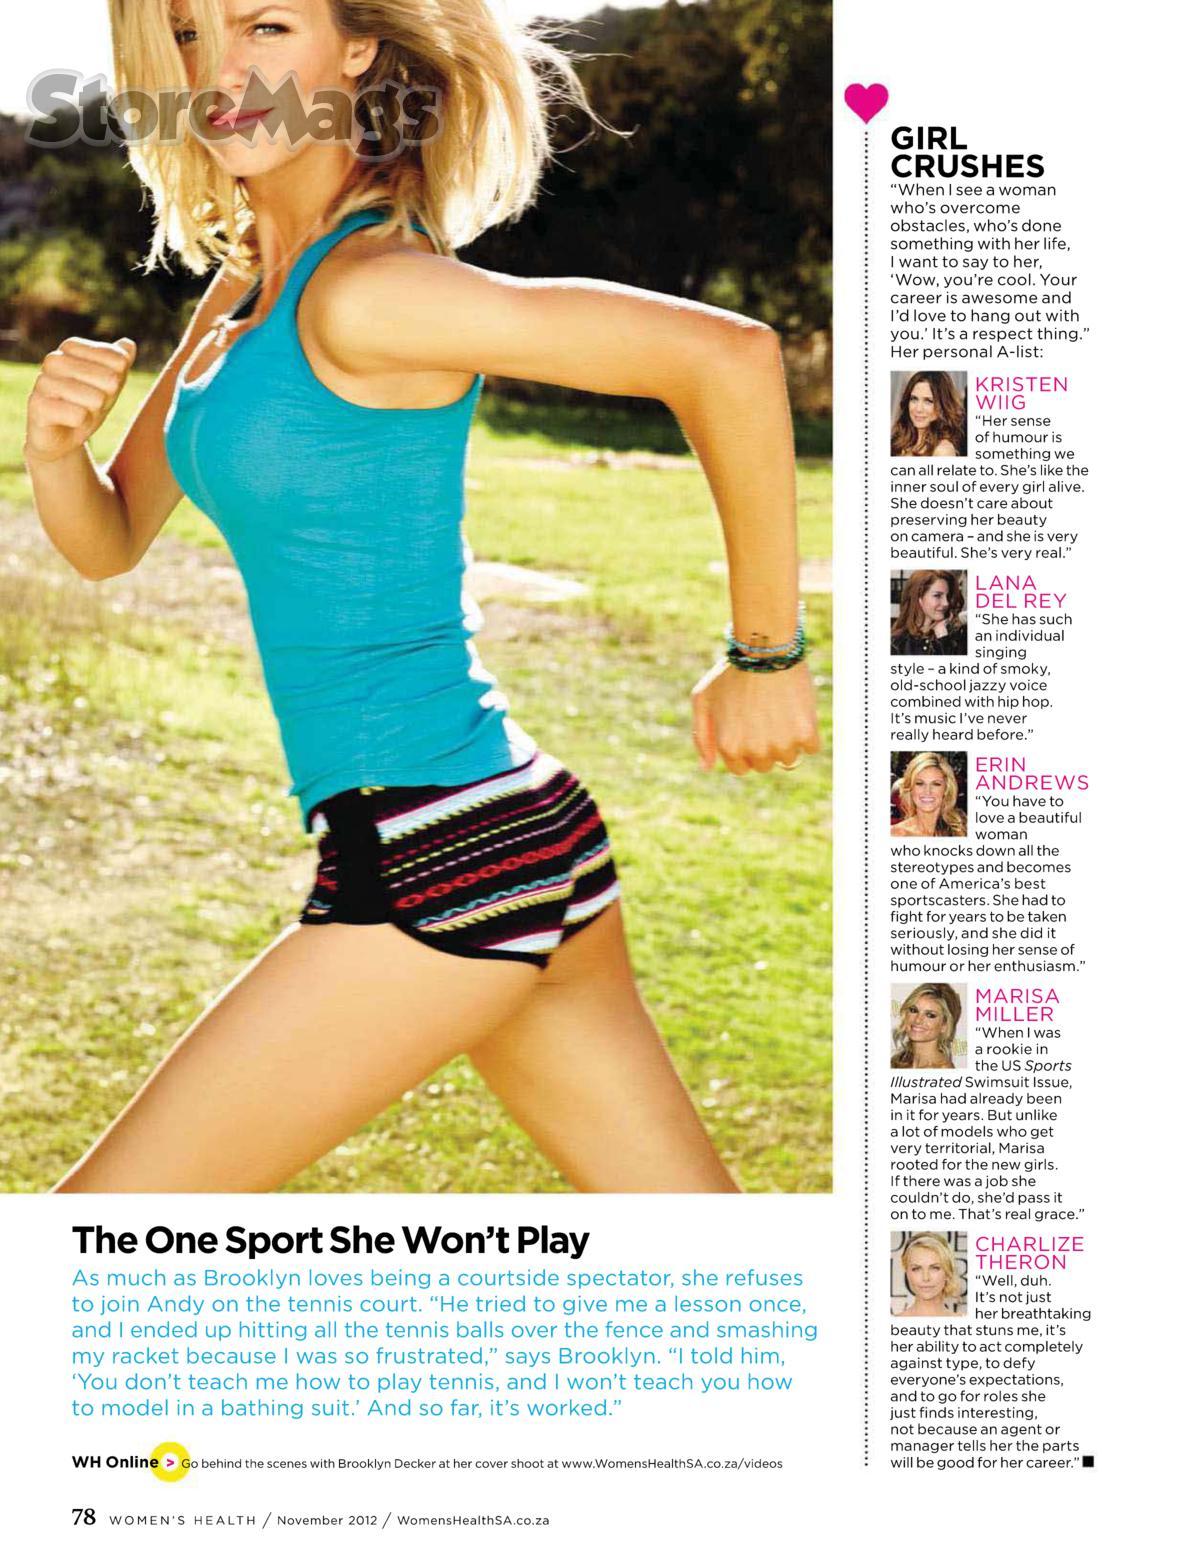 Women's Health Magazine September Issue 2016 English Sofía Vergara Poses Nude